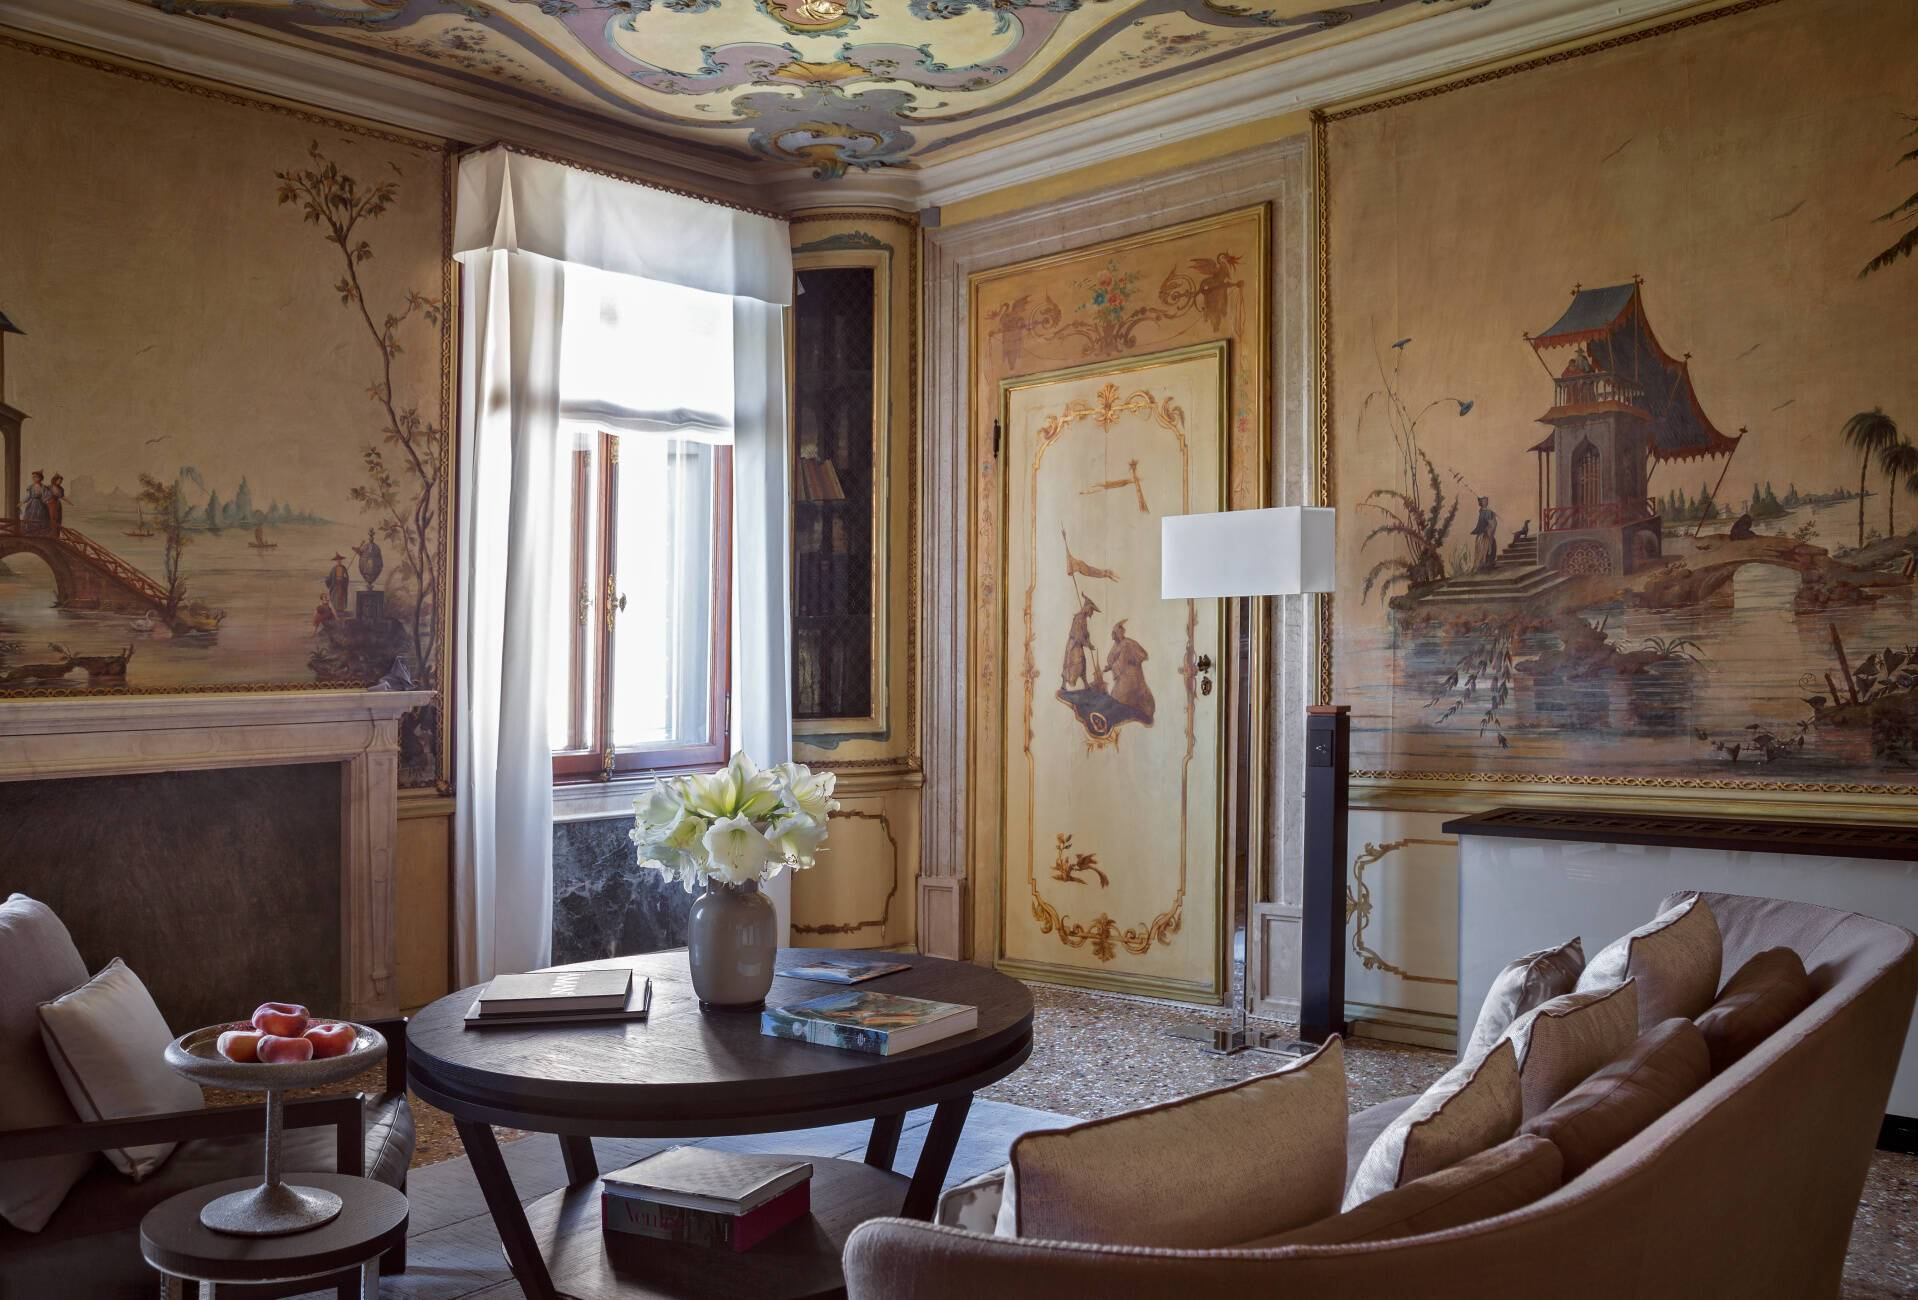 Aman Venise Alcova Tiepolo Suite